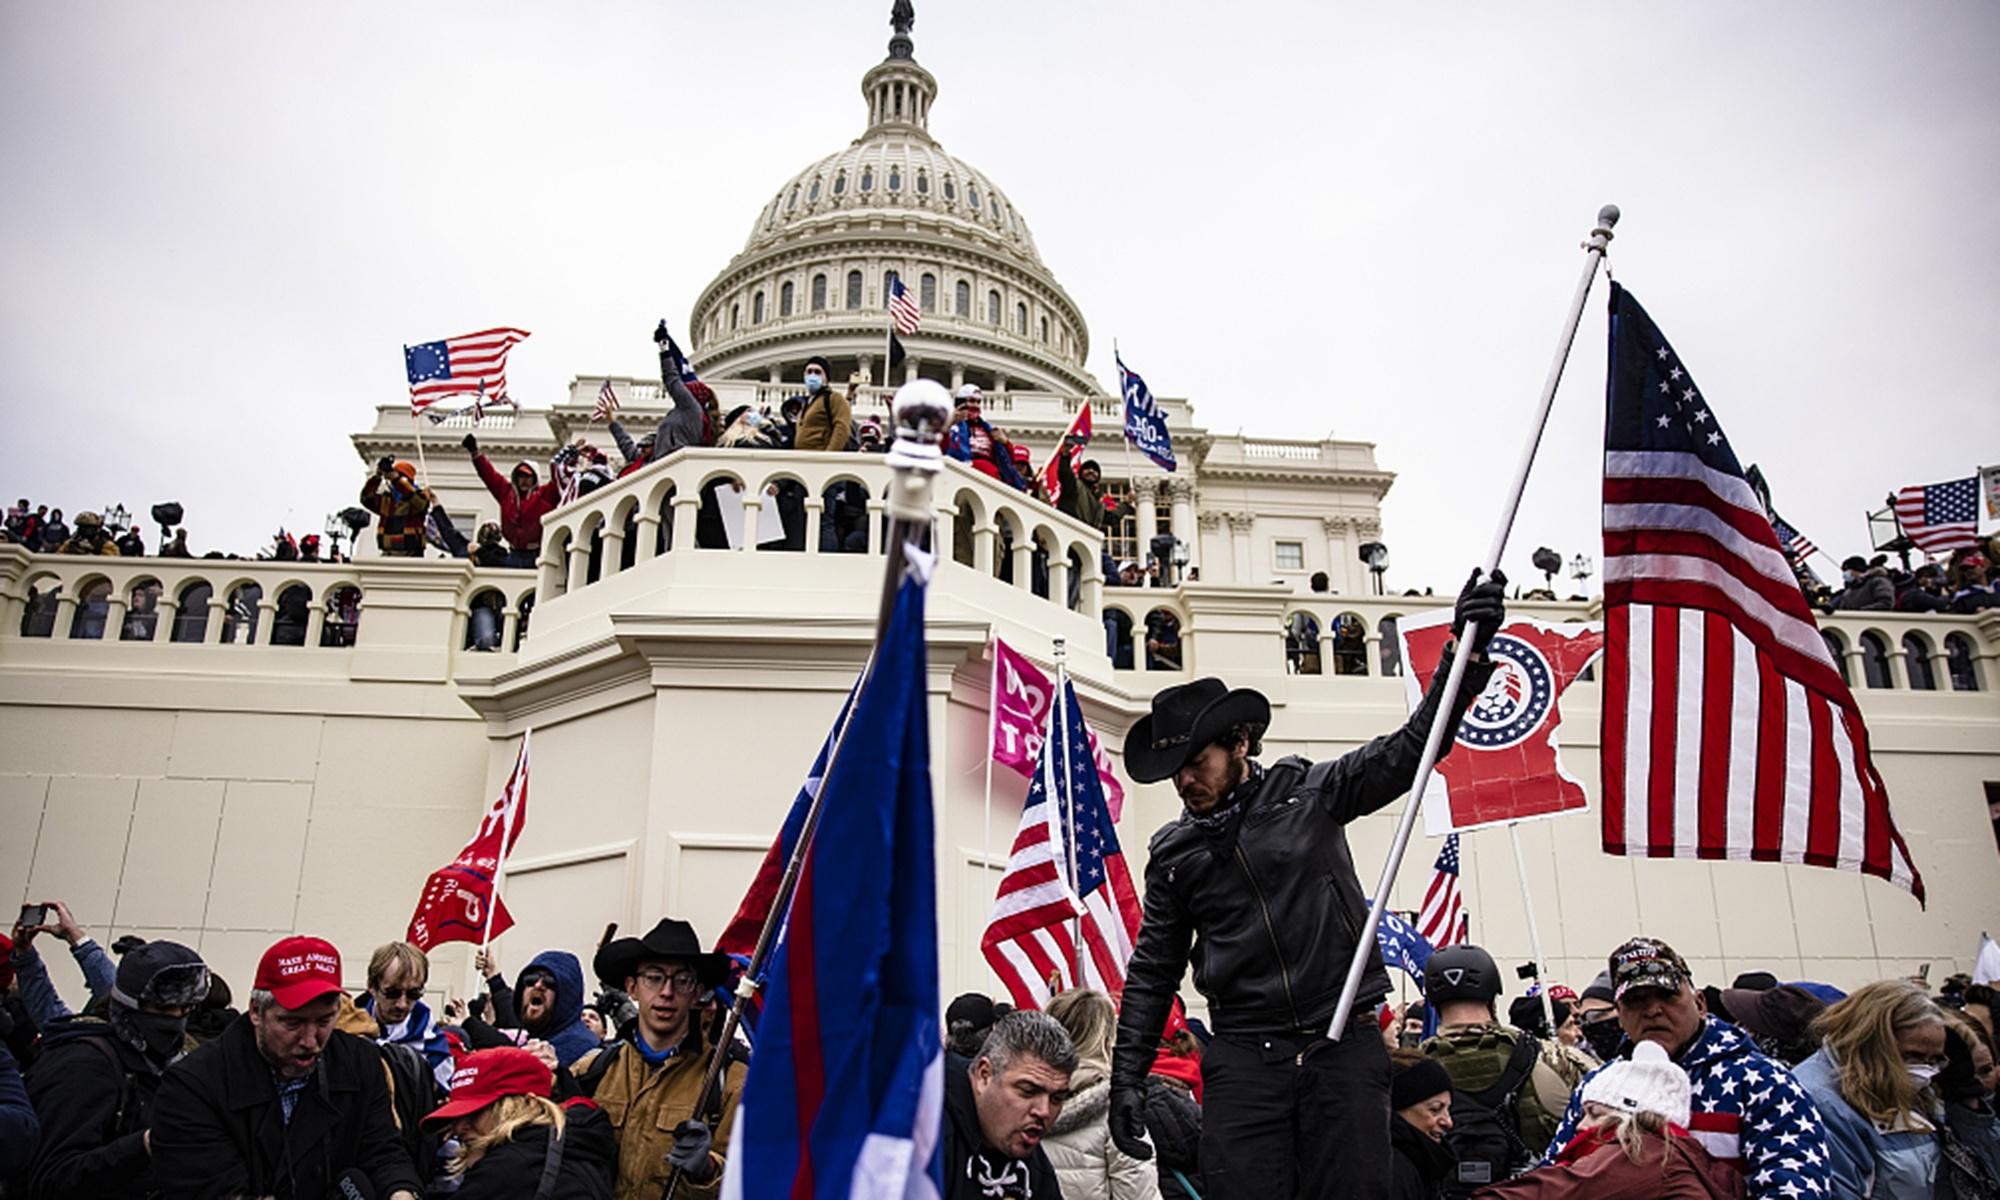 Capital vandals show fragility of US democracy